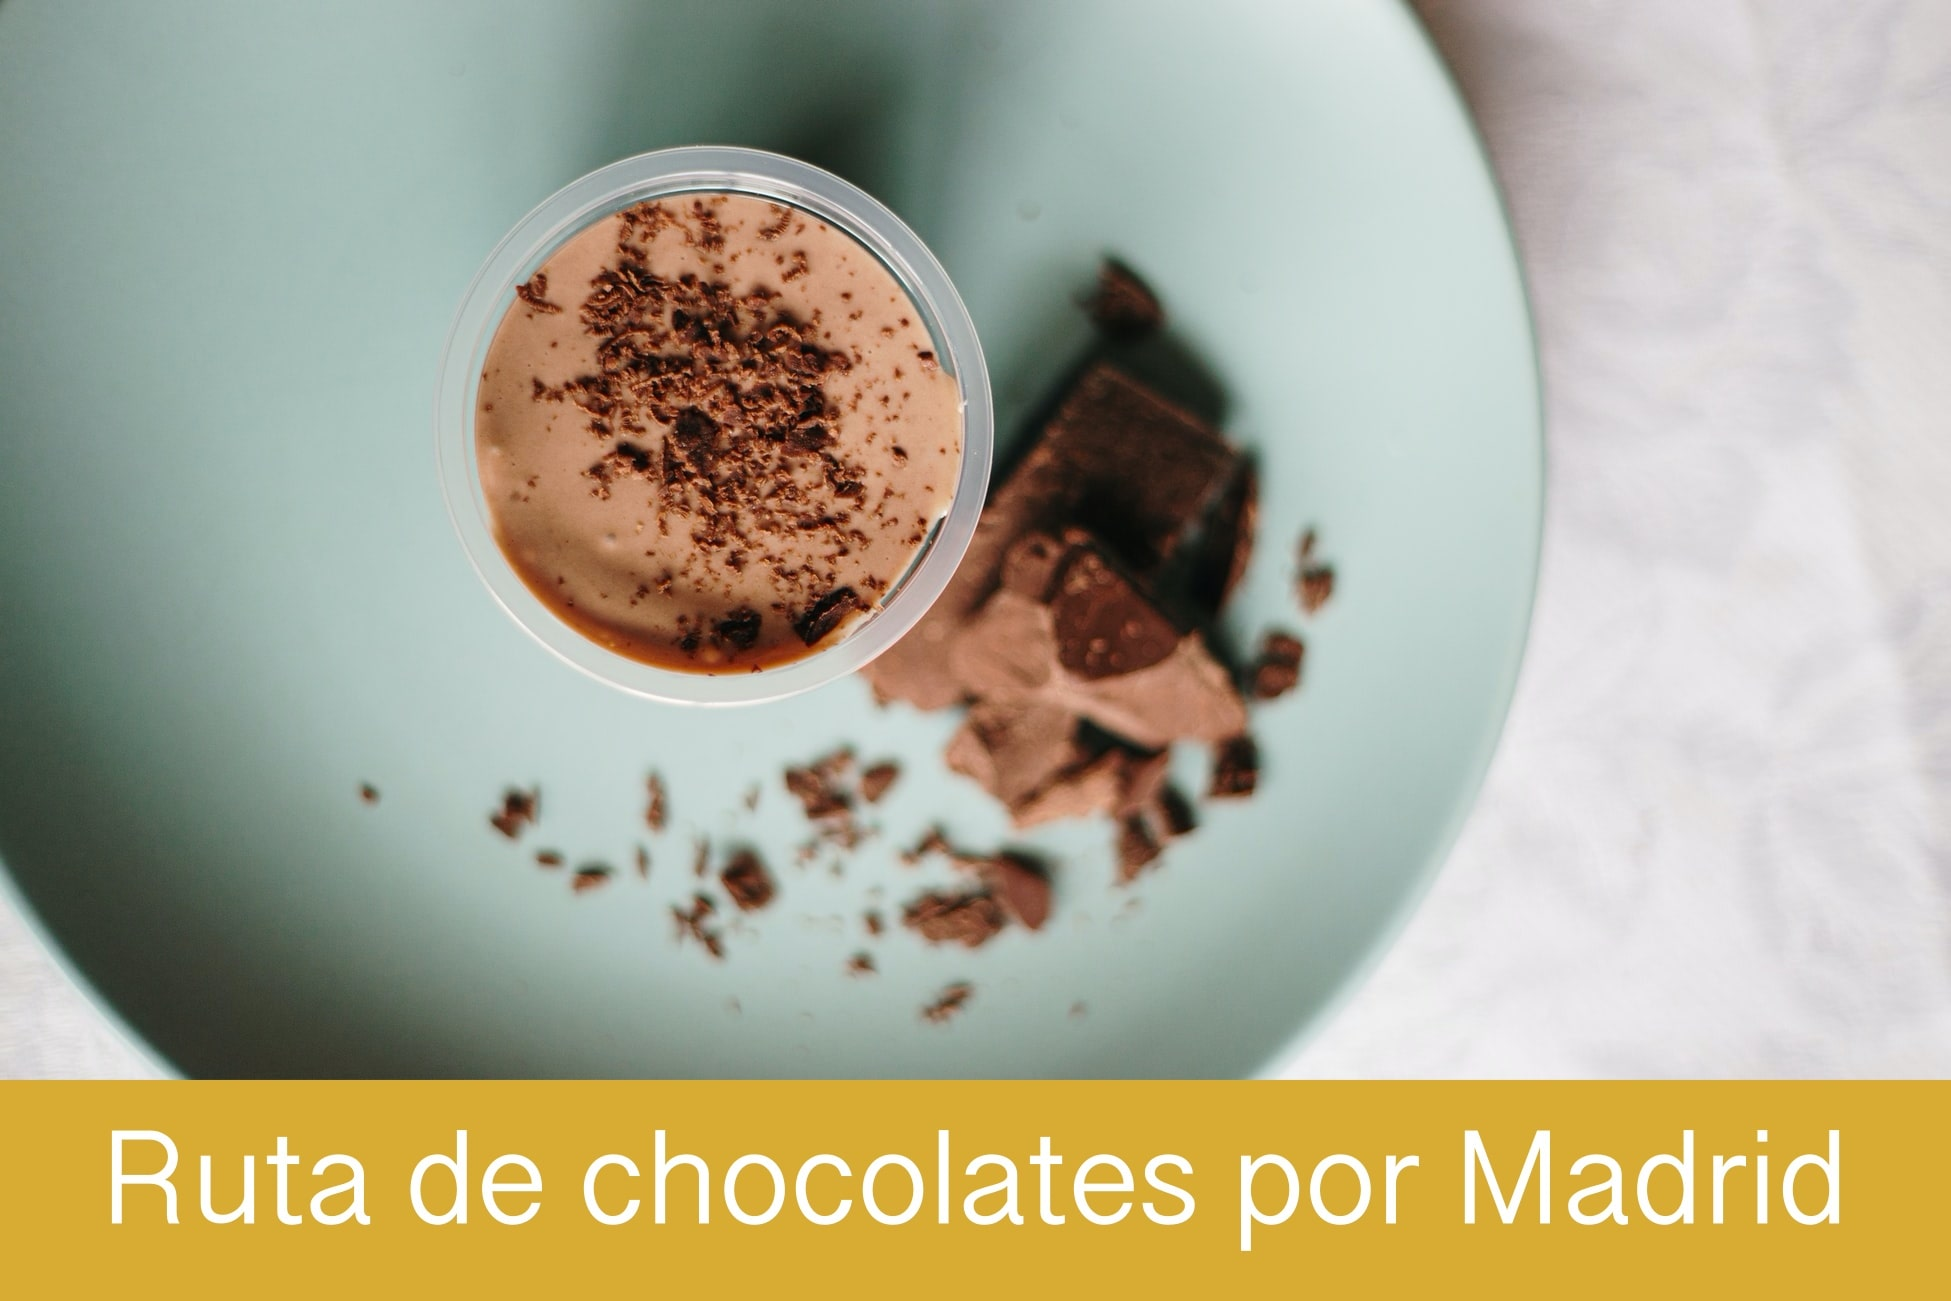 Ruta de chocolate maDRID